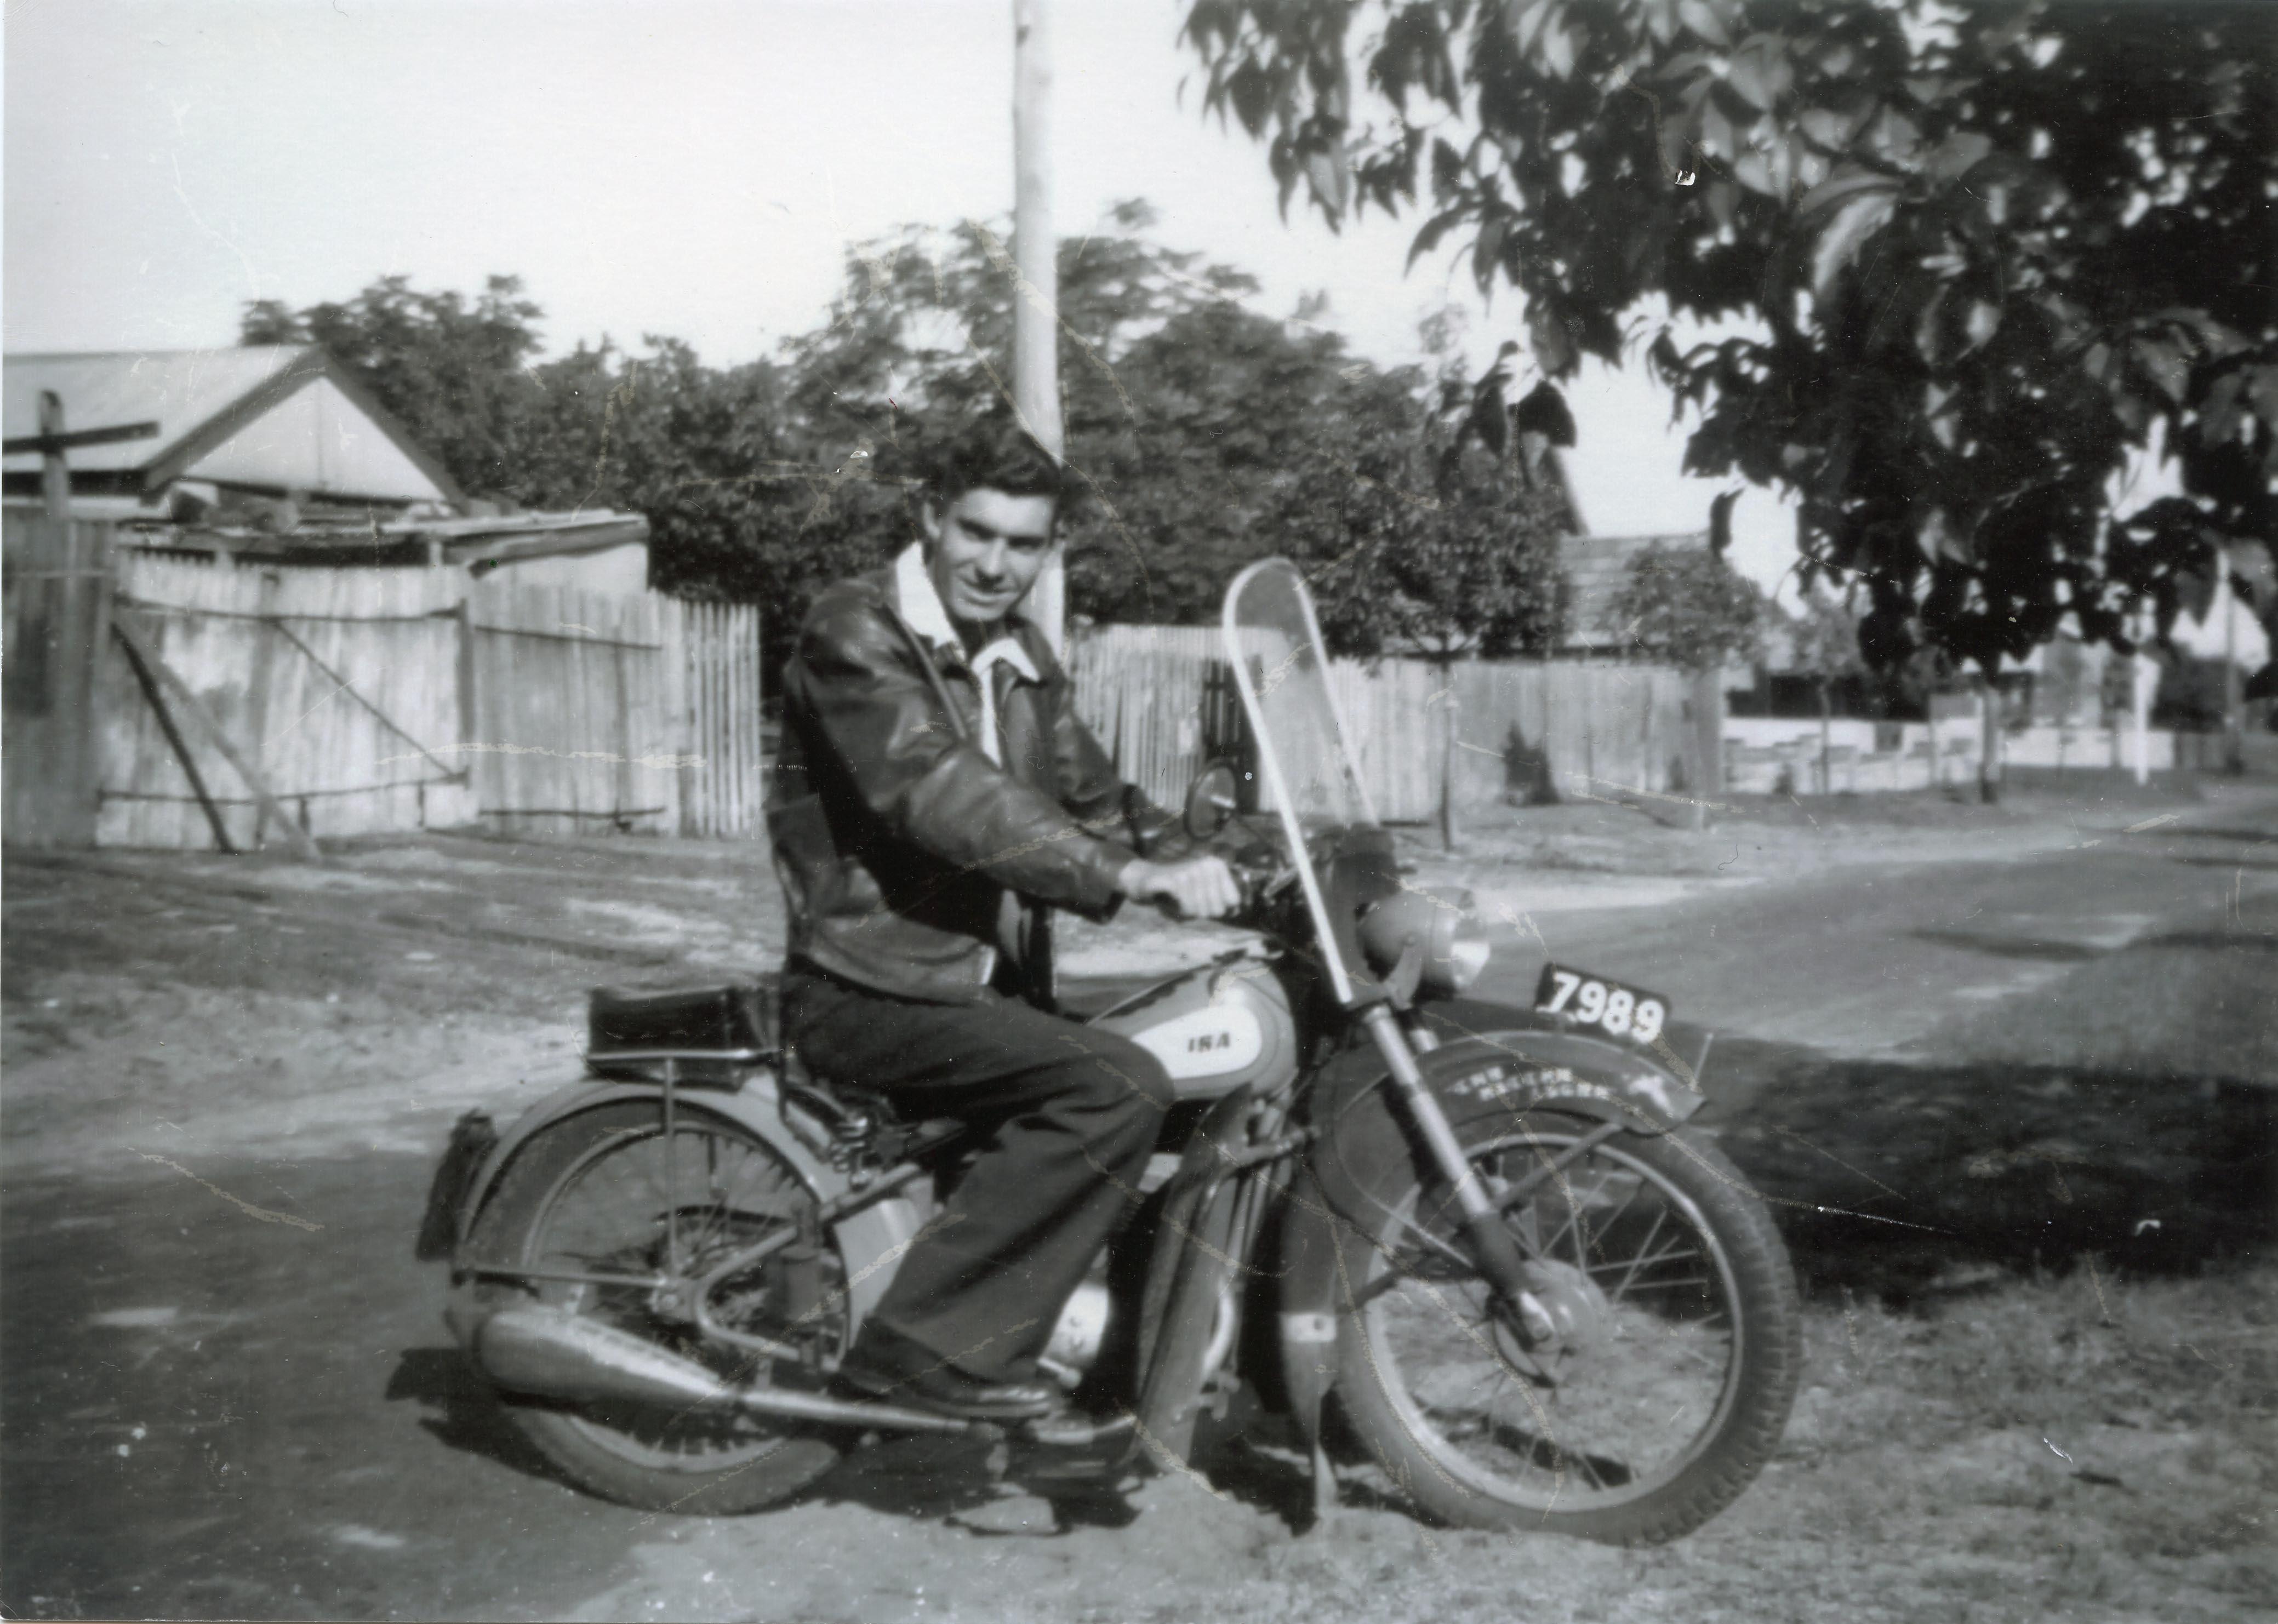 23. George Long at 7 Peach St, 1950